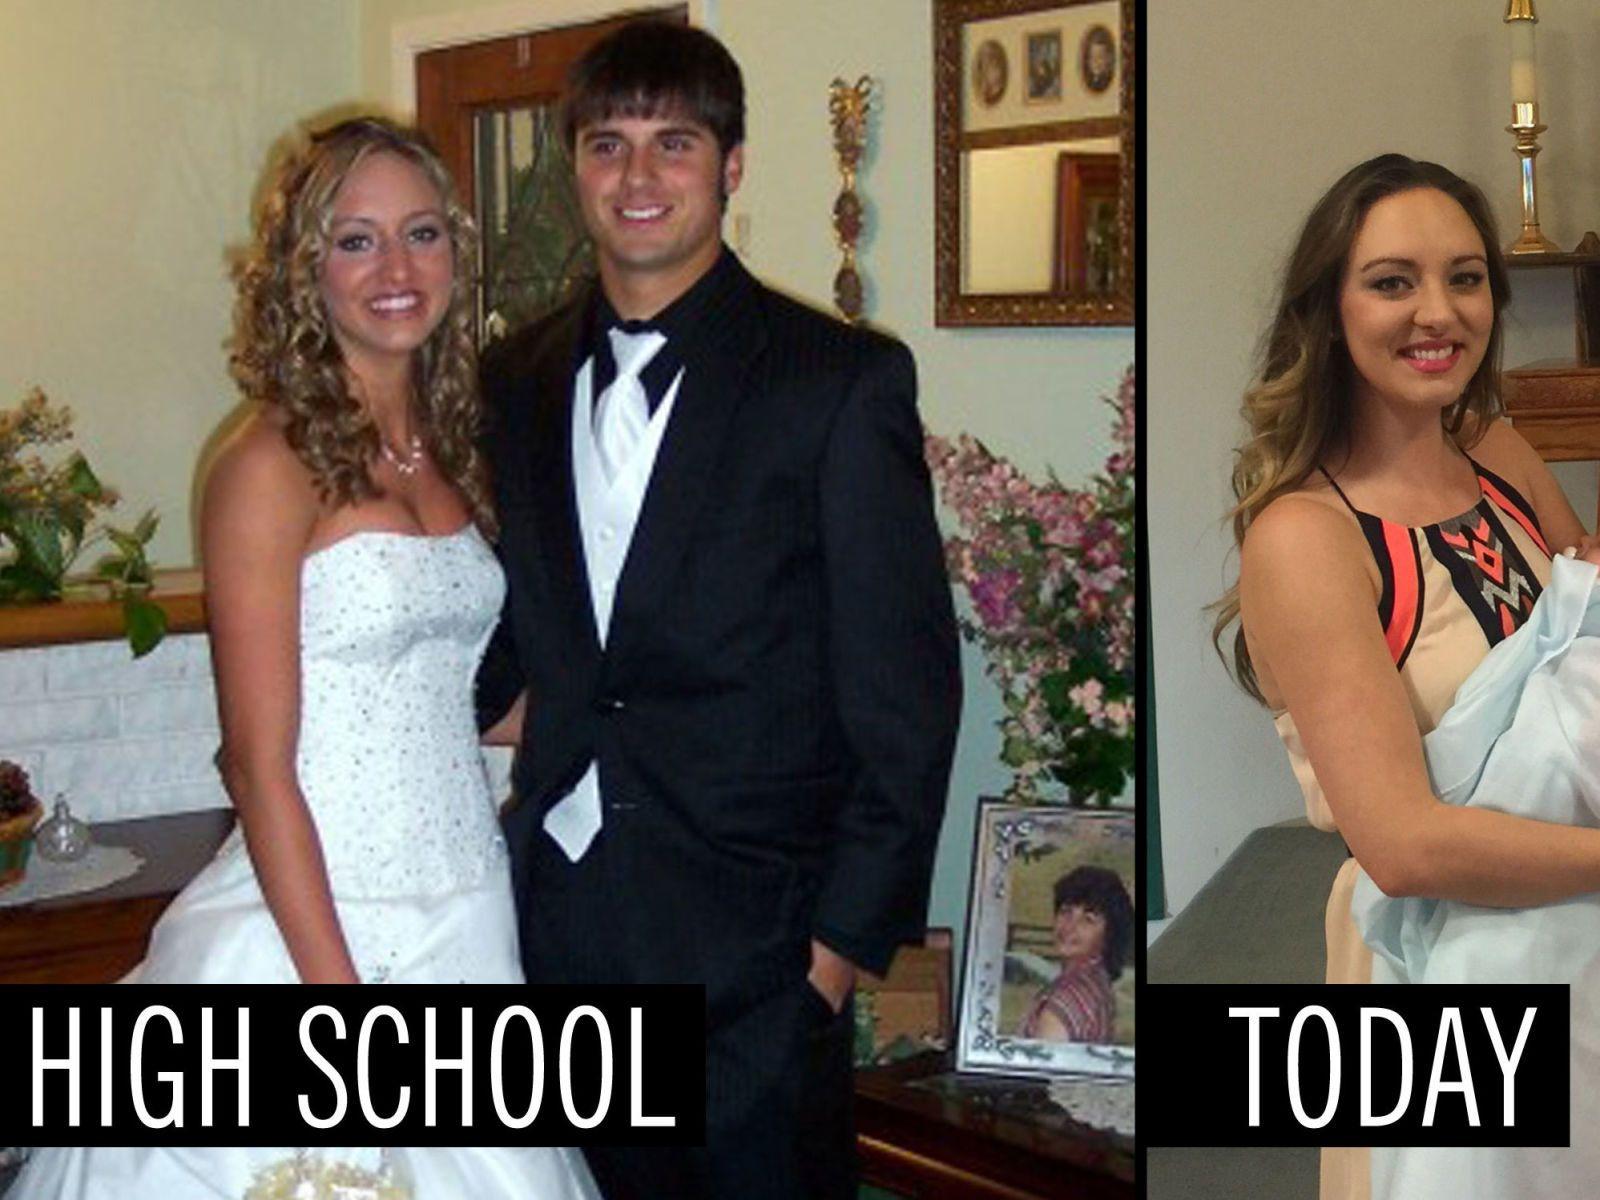 Marry high school sweetheart